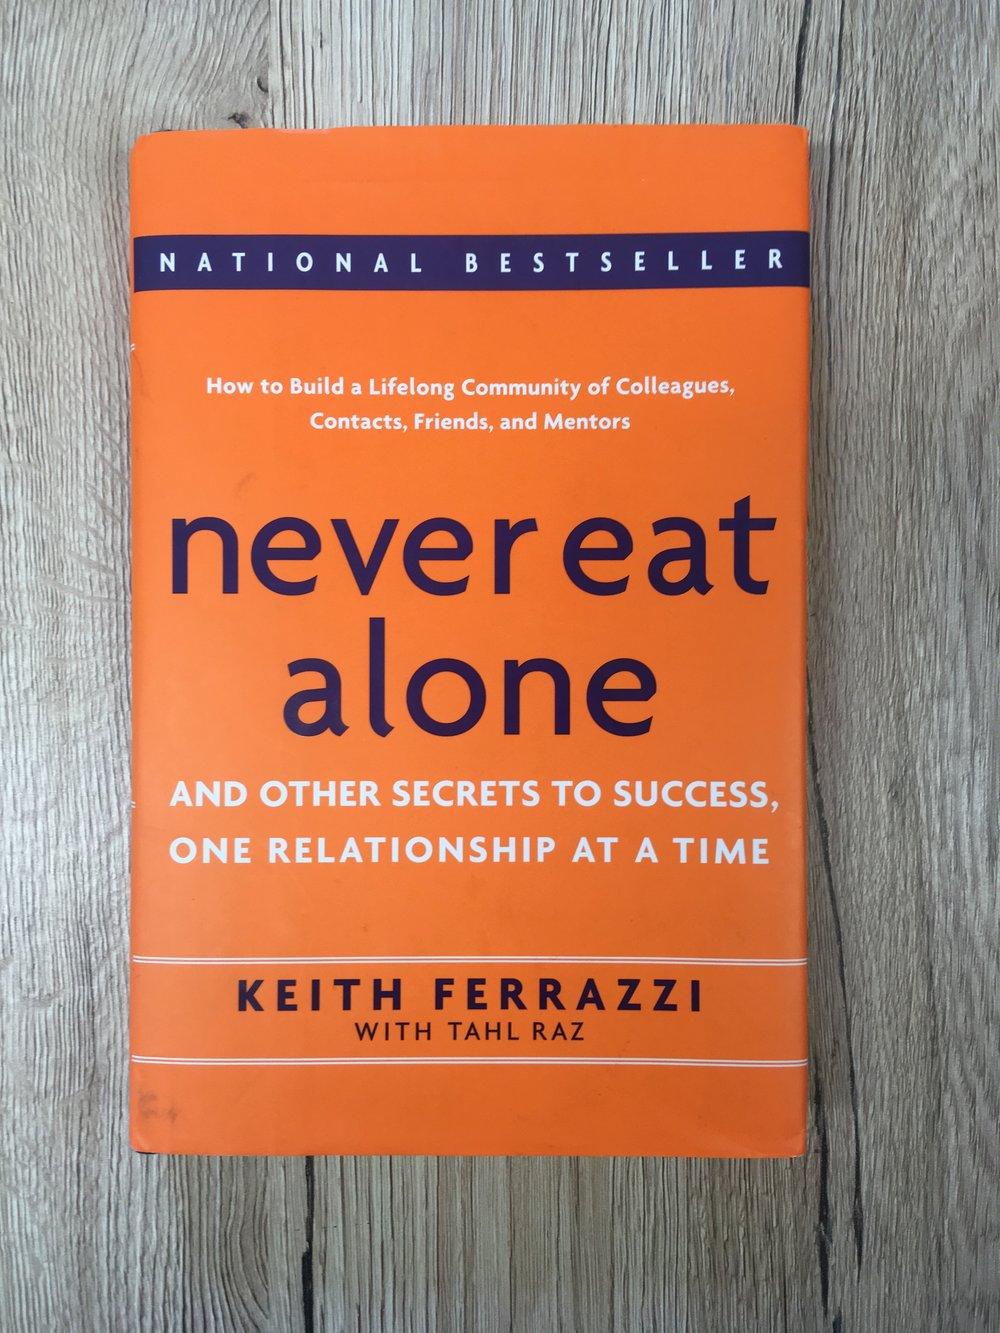 Never Eat Alone - Keith Ferrazzi.JPG